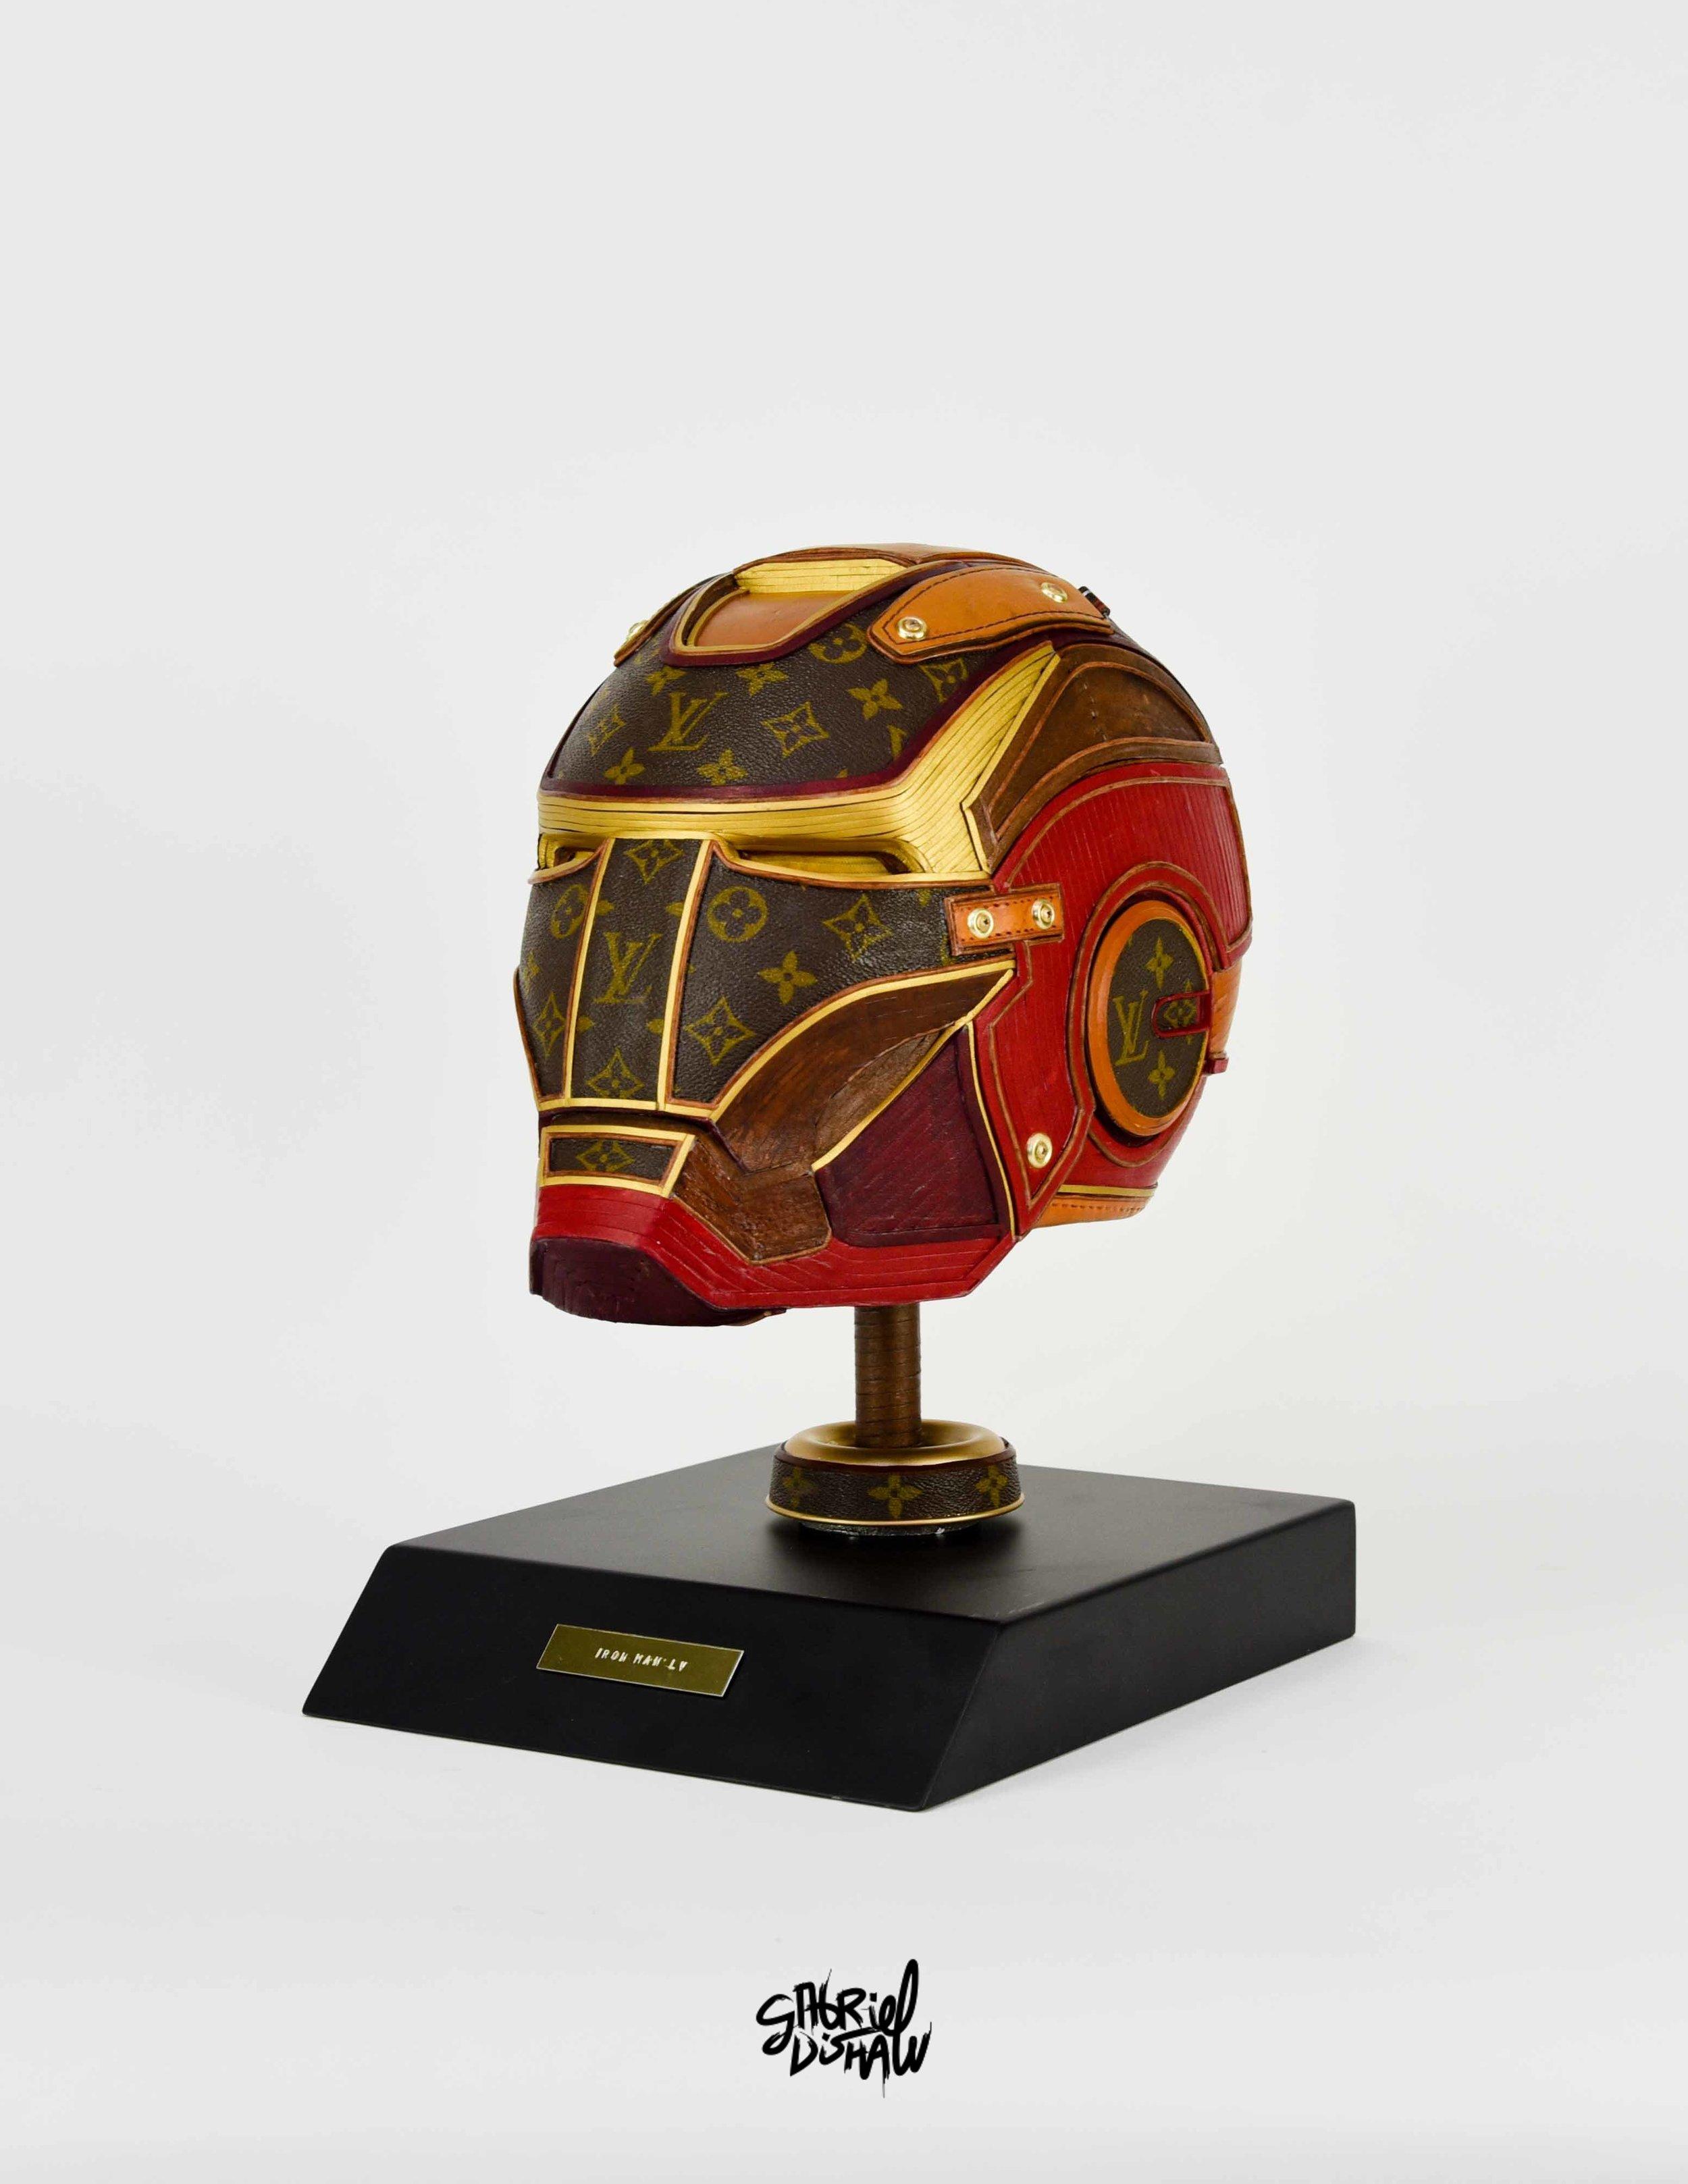 Gabriel Dishaw Iron Man LV-4275.jpg